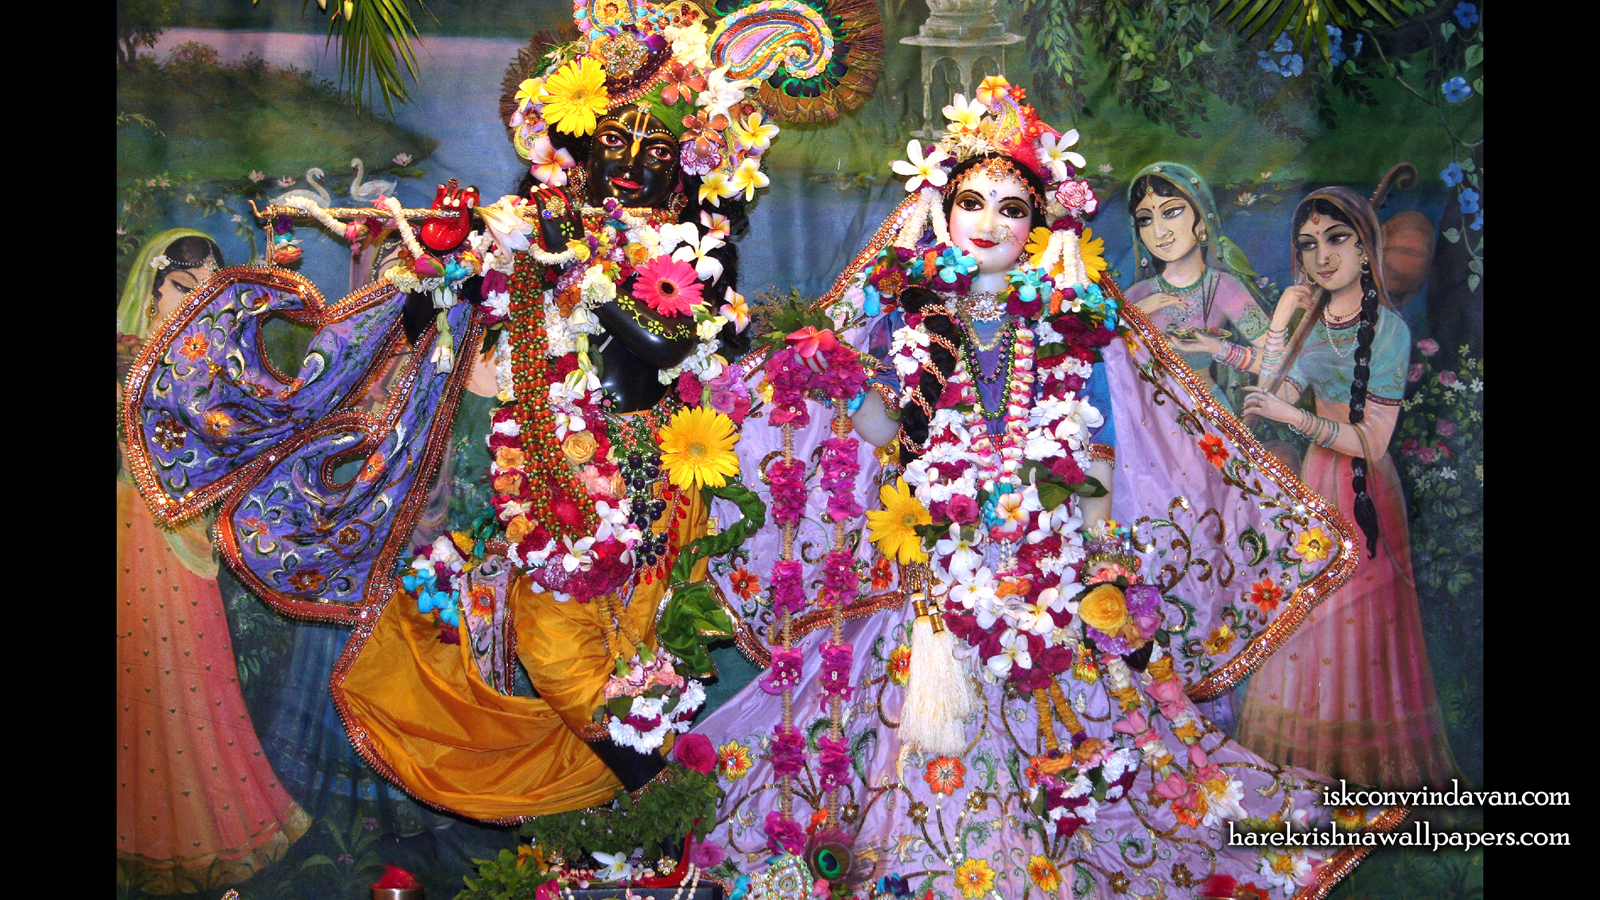 Sri Sri Radha Shyamsundar Wallpaper (014) Size 1600x900 Download